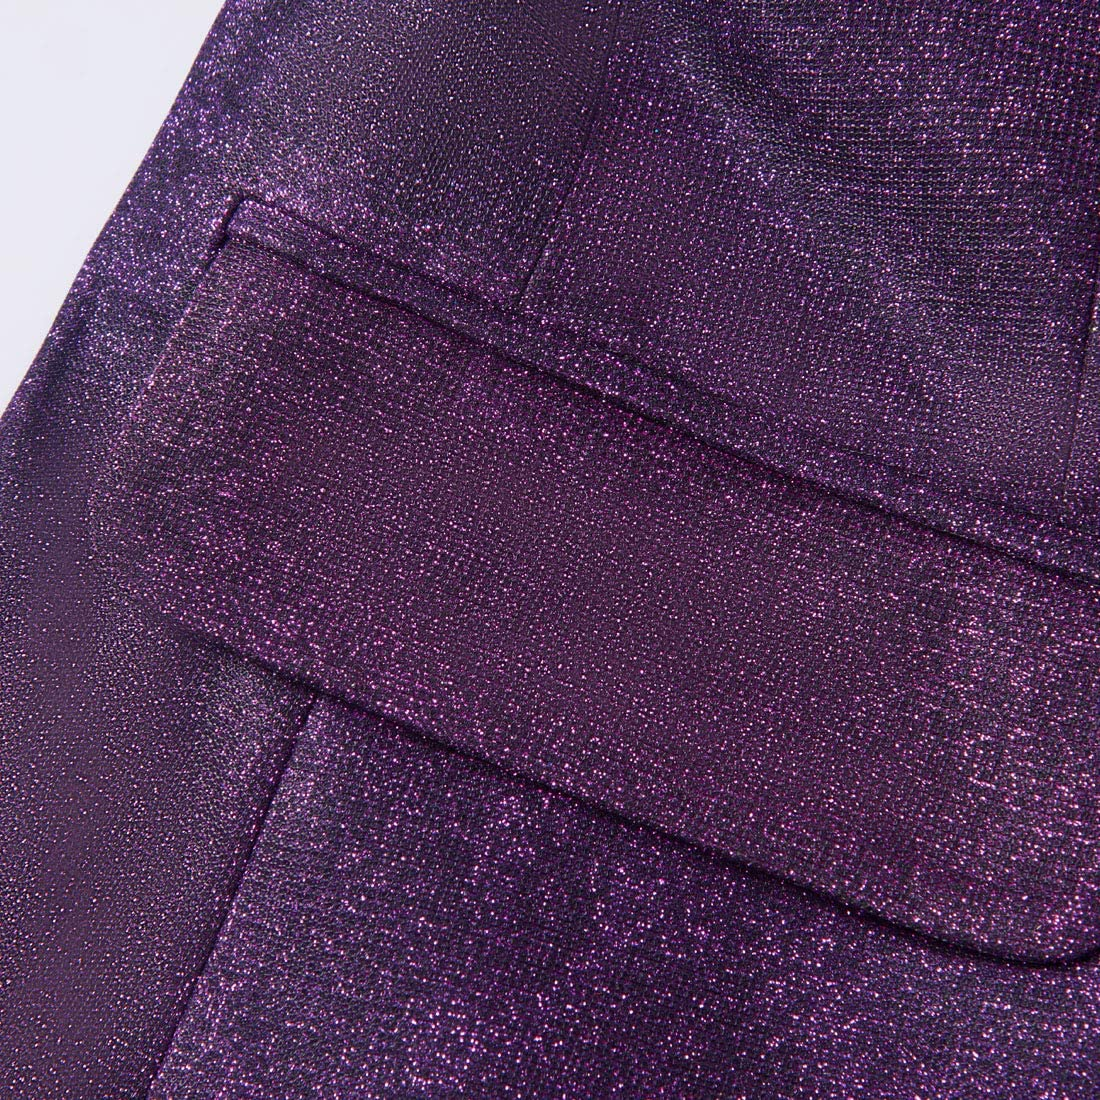 PYJTRL Mens Fashion Gradient Color Shiny Slim Fit Blazer Shawl Lapel Suit Jacket